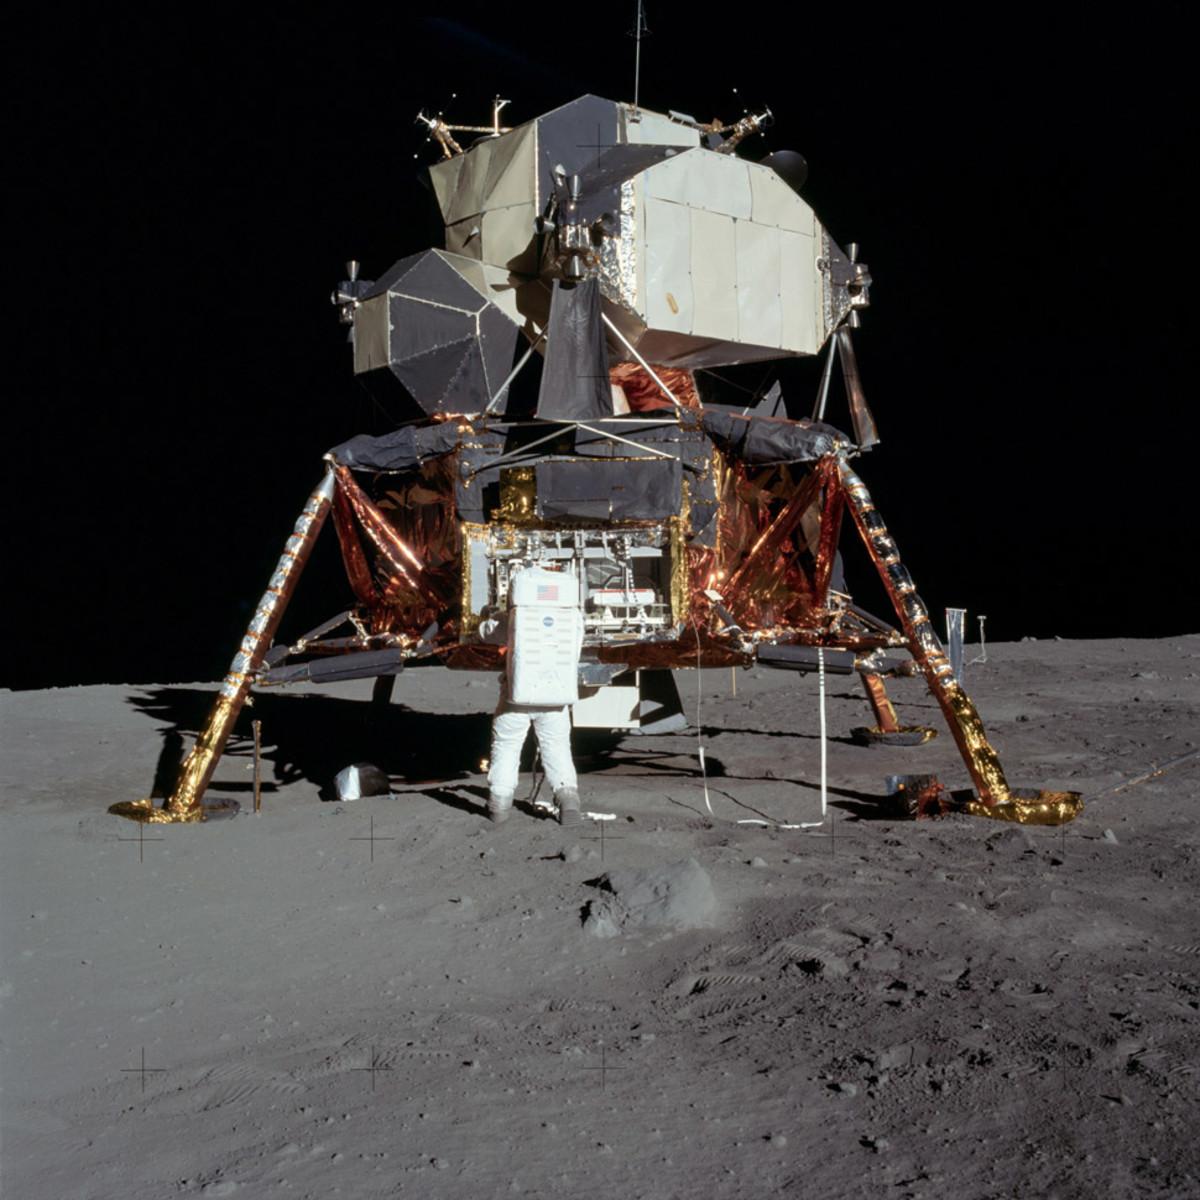 Unpacking-Experements-Apollo-11-GEar-Patrol